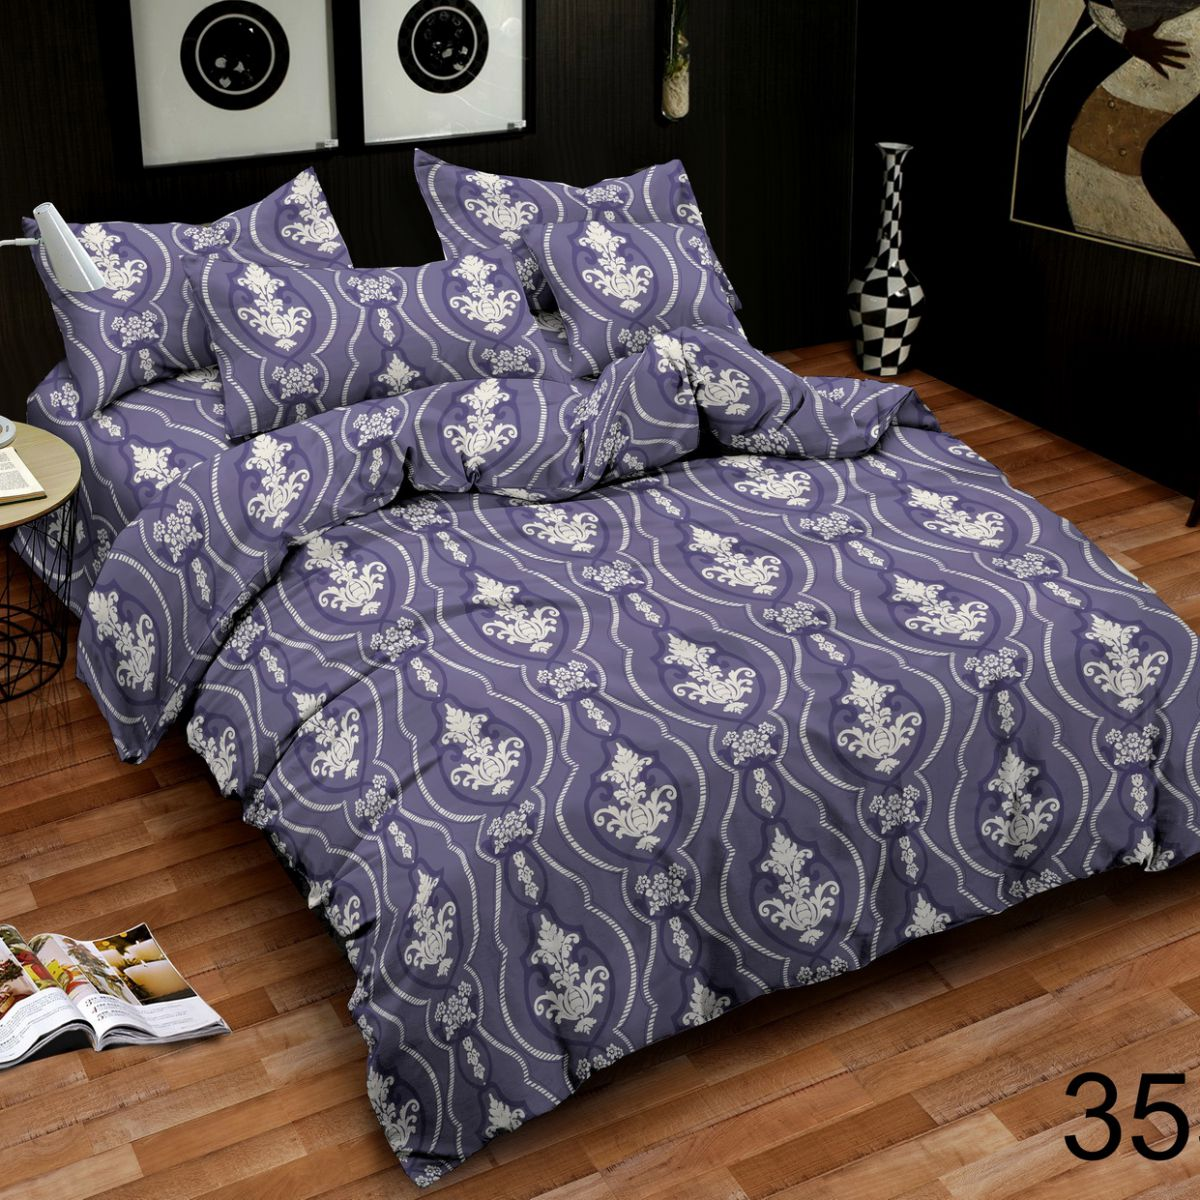 3D Beddings - Antonio - AML-355 - 160x200 cm - 4 pcs